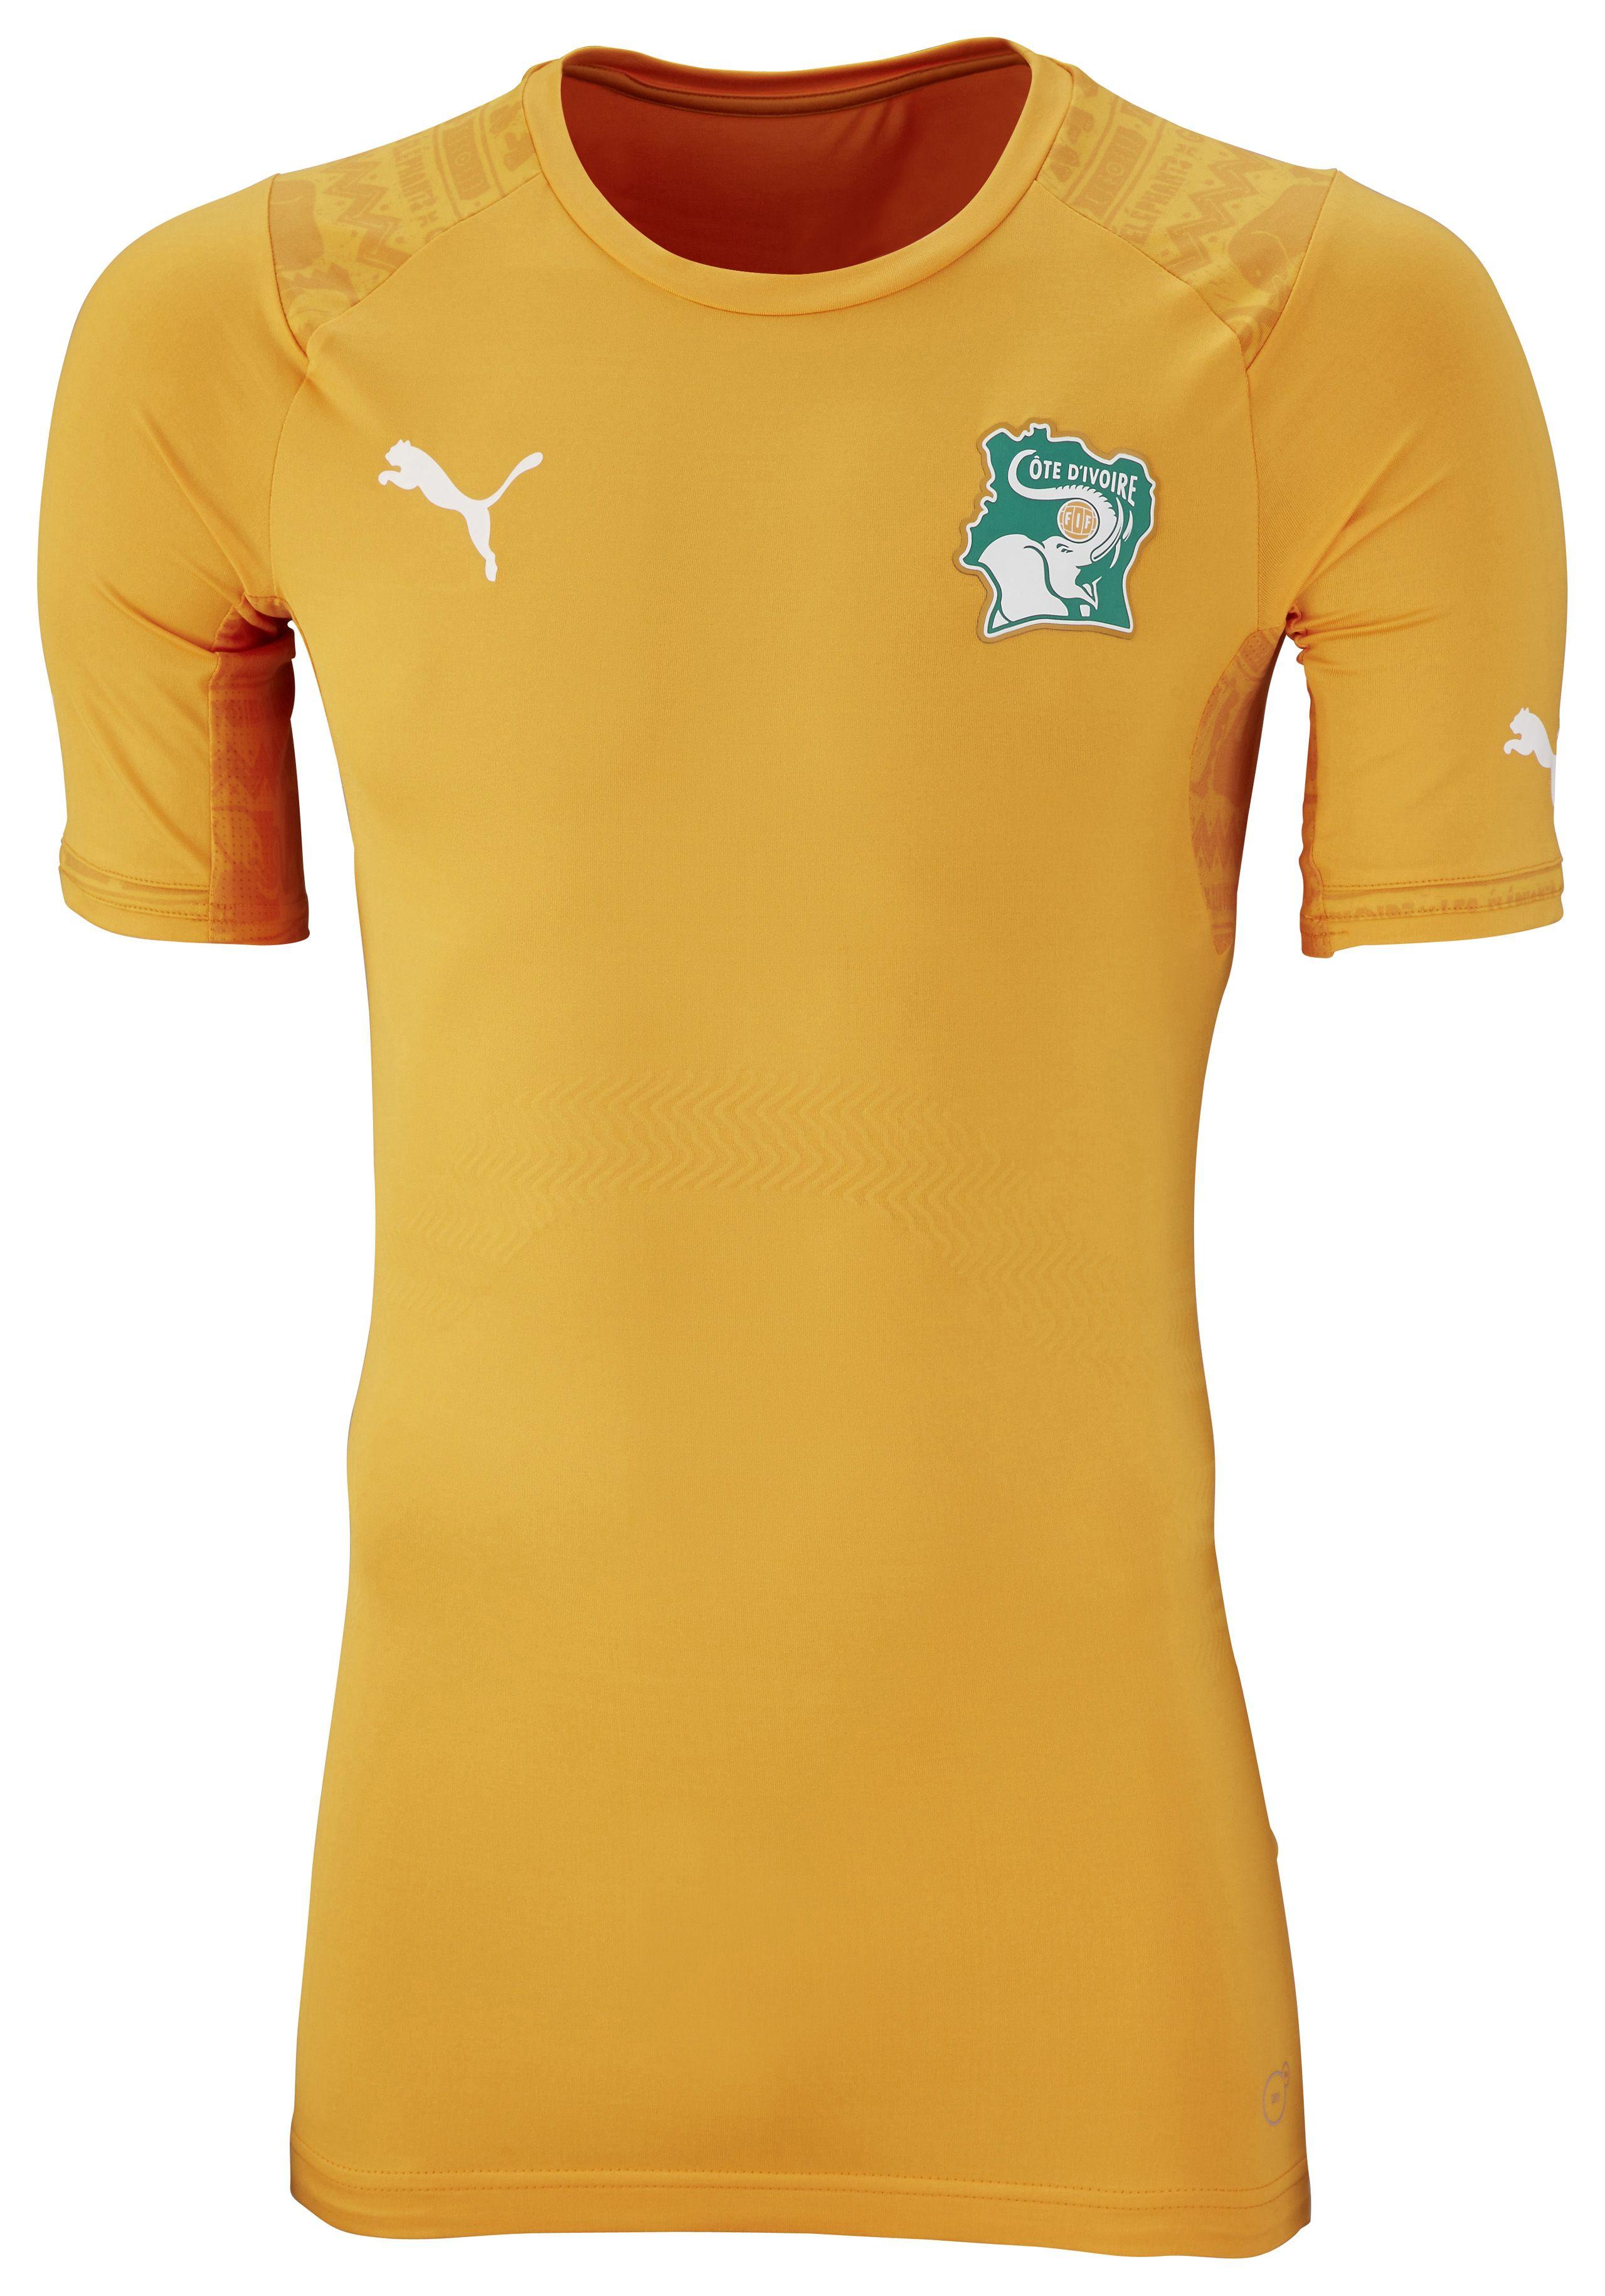 Ivory Coast World Cup jersey 2014 (Puma)  949eb1938296c